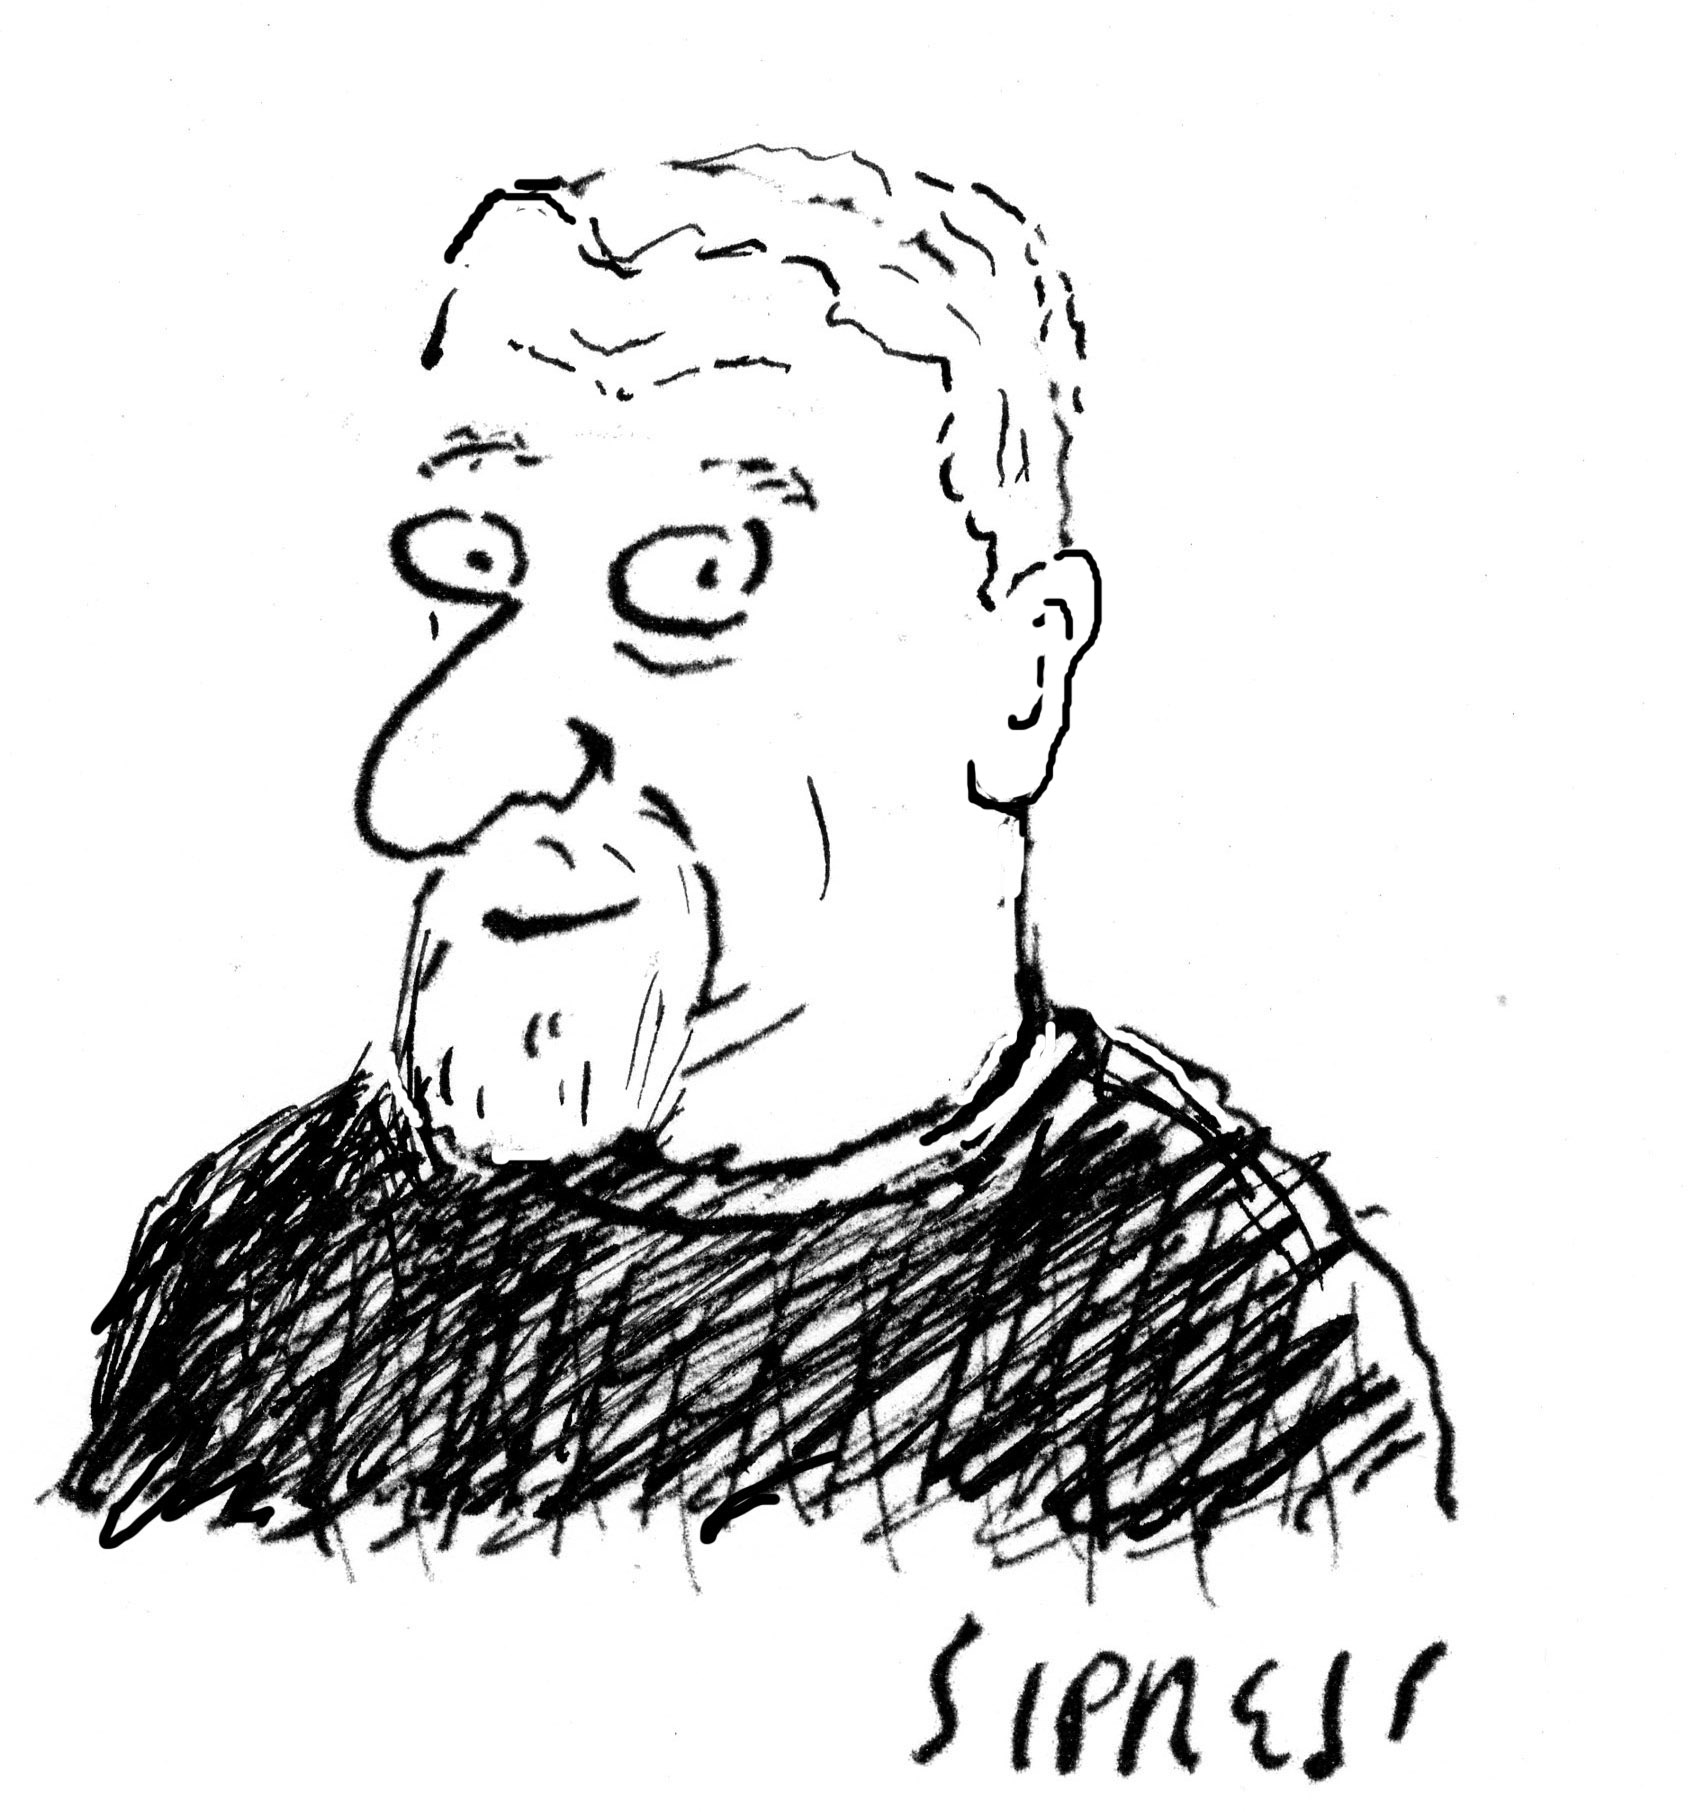 David Sipress